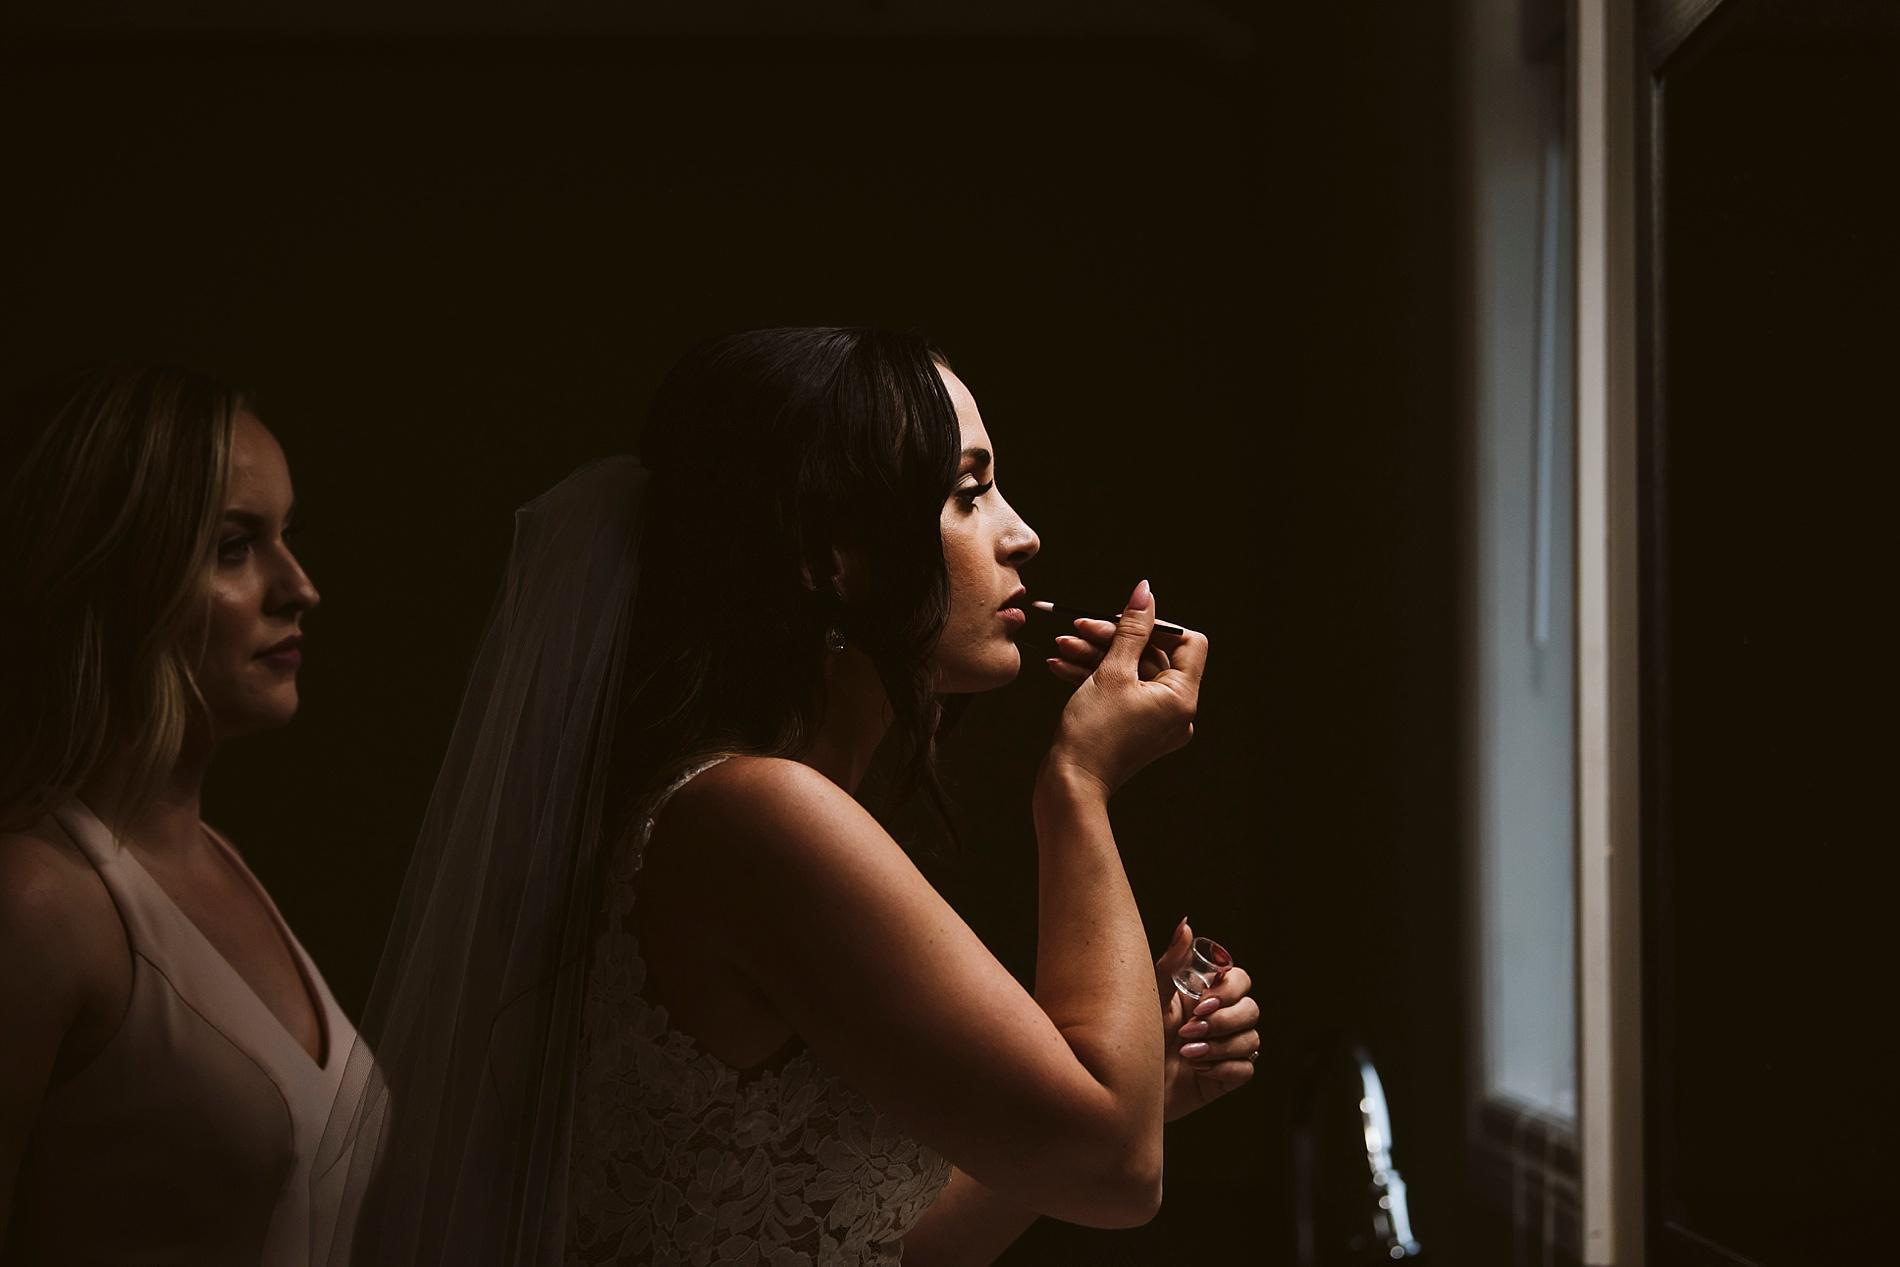 Kawartha_Lakes_Wedding_Bobcageon_Eganridge_Resort_Toronto_Photographer_0019.jpg